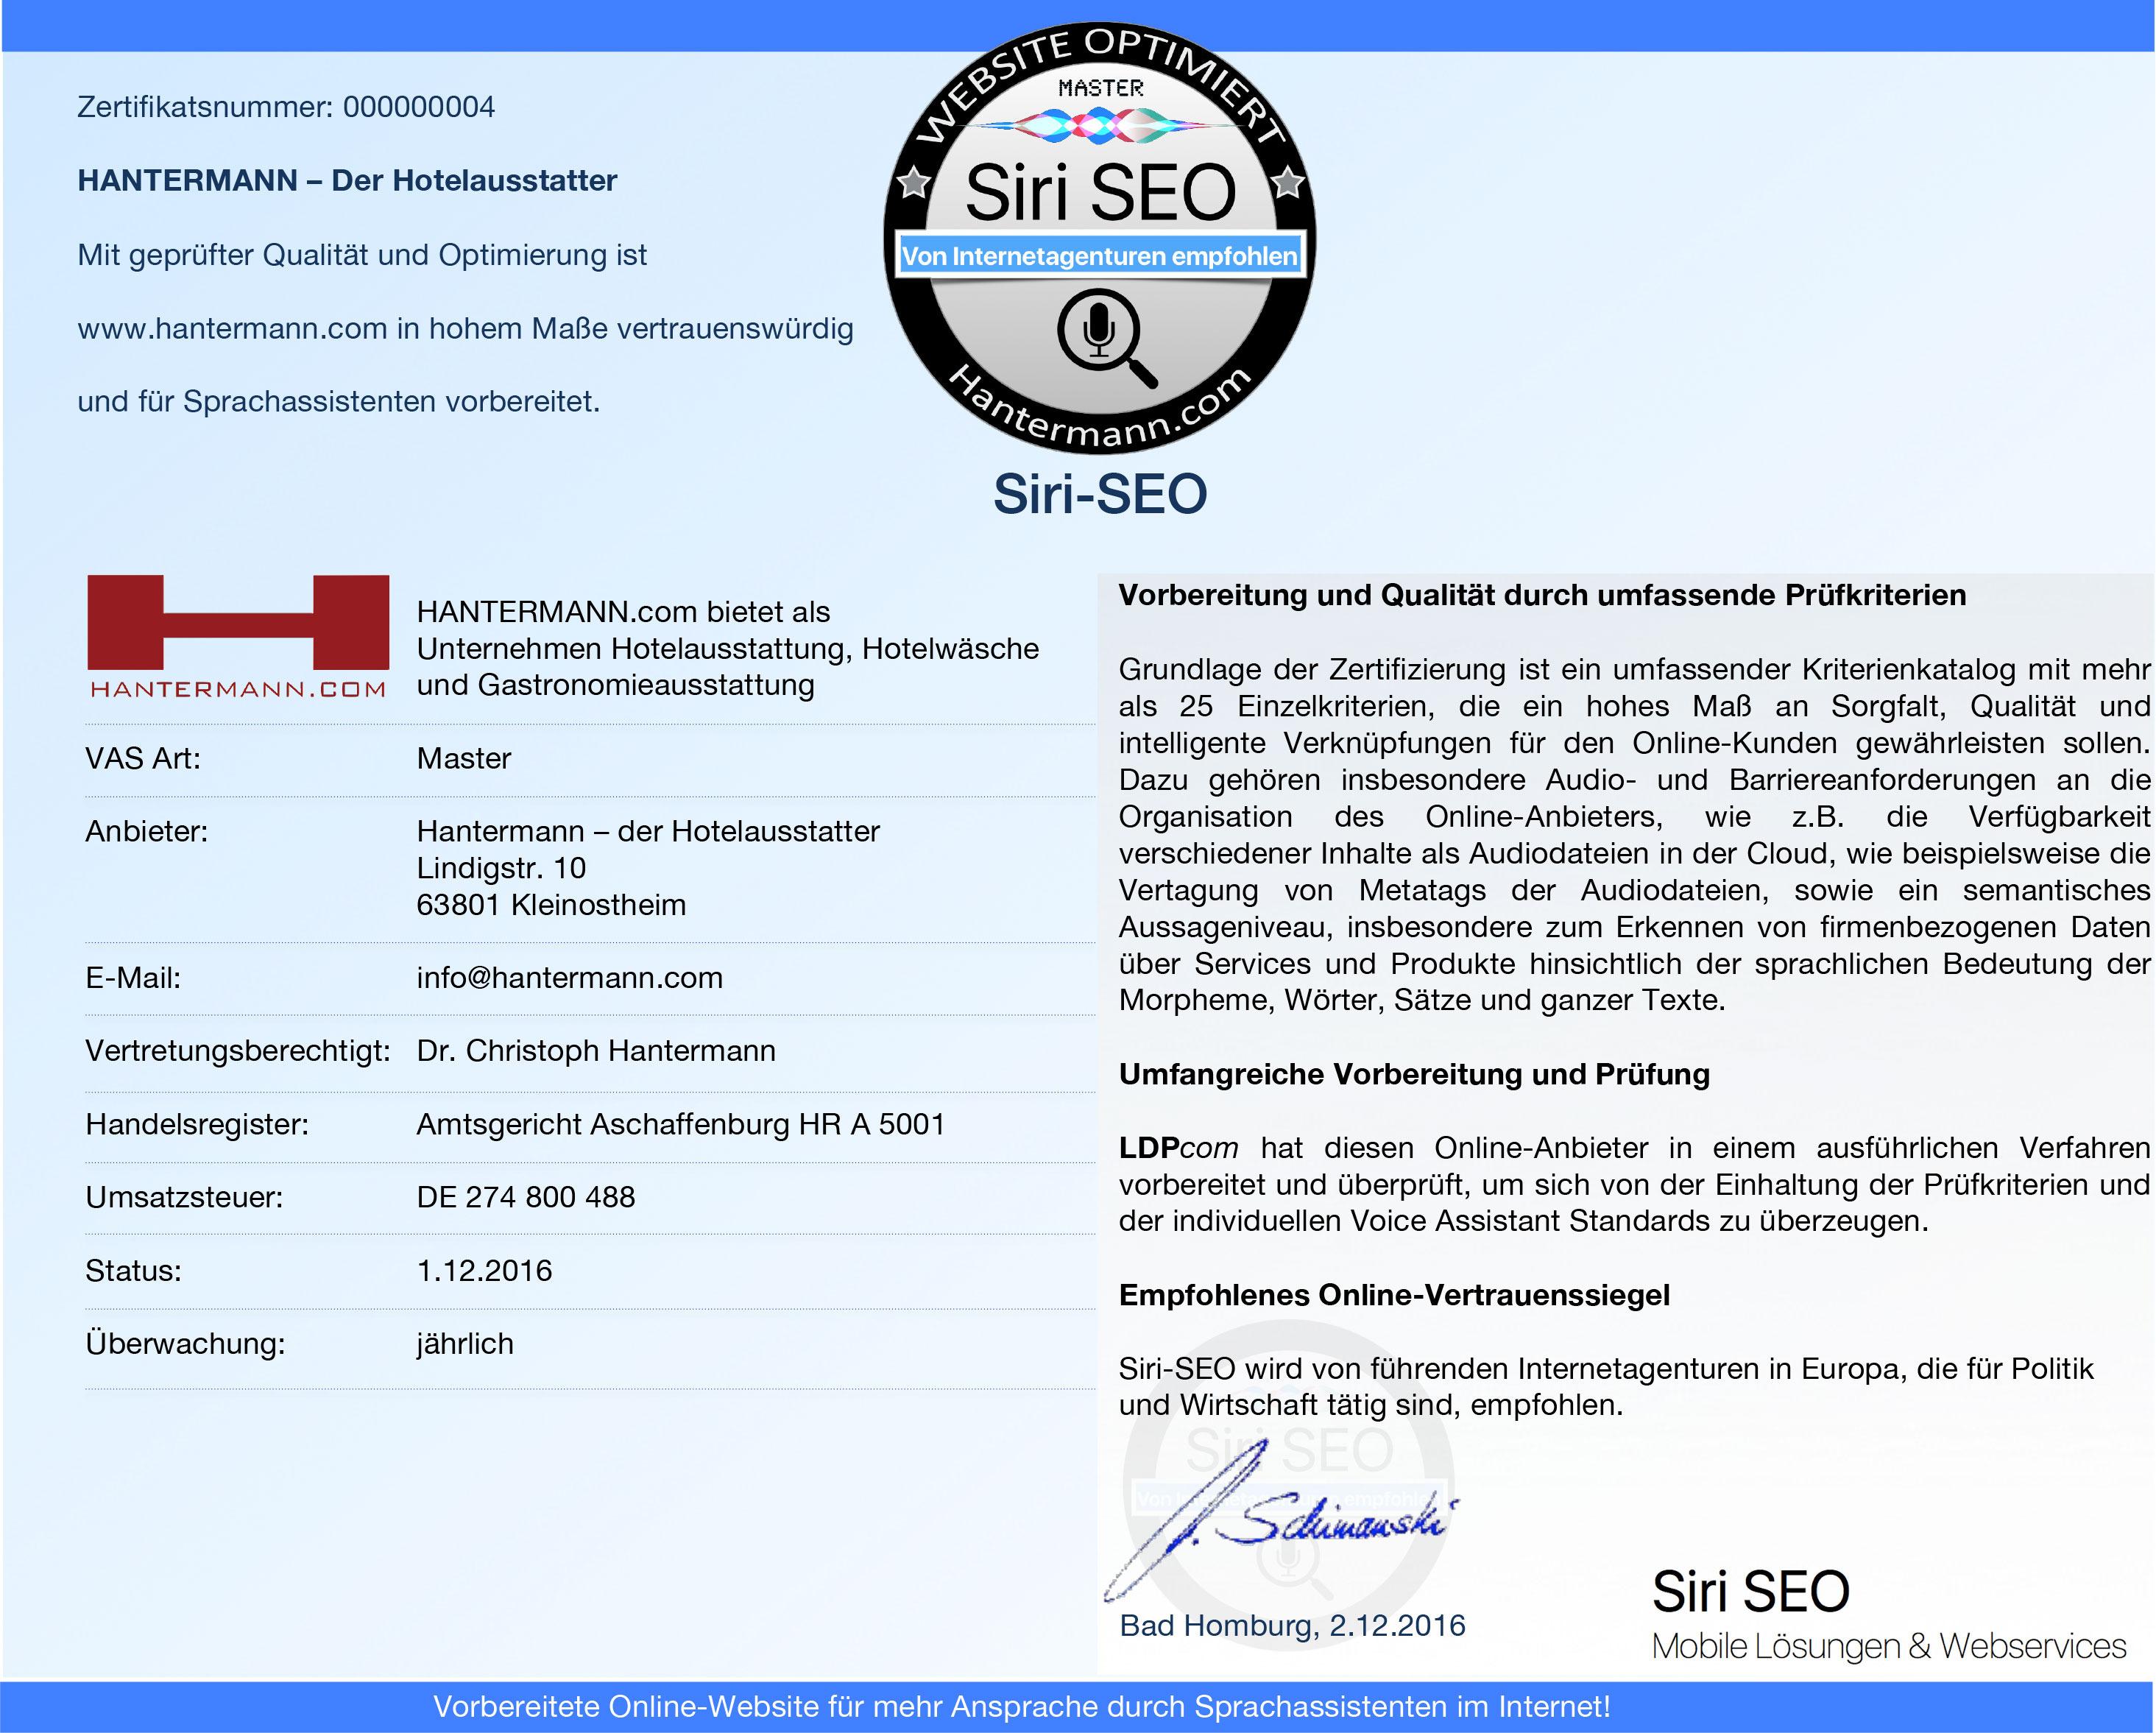 Siri SEO Zertifikat